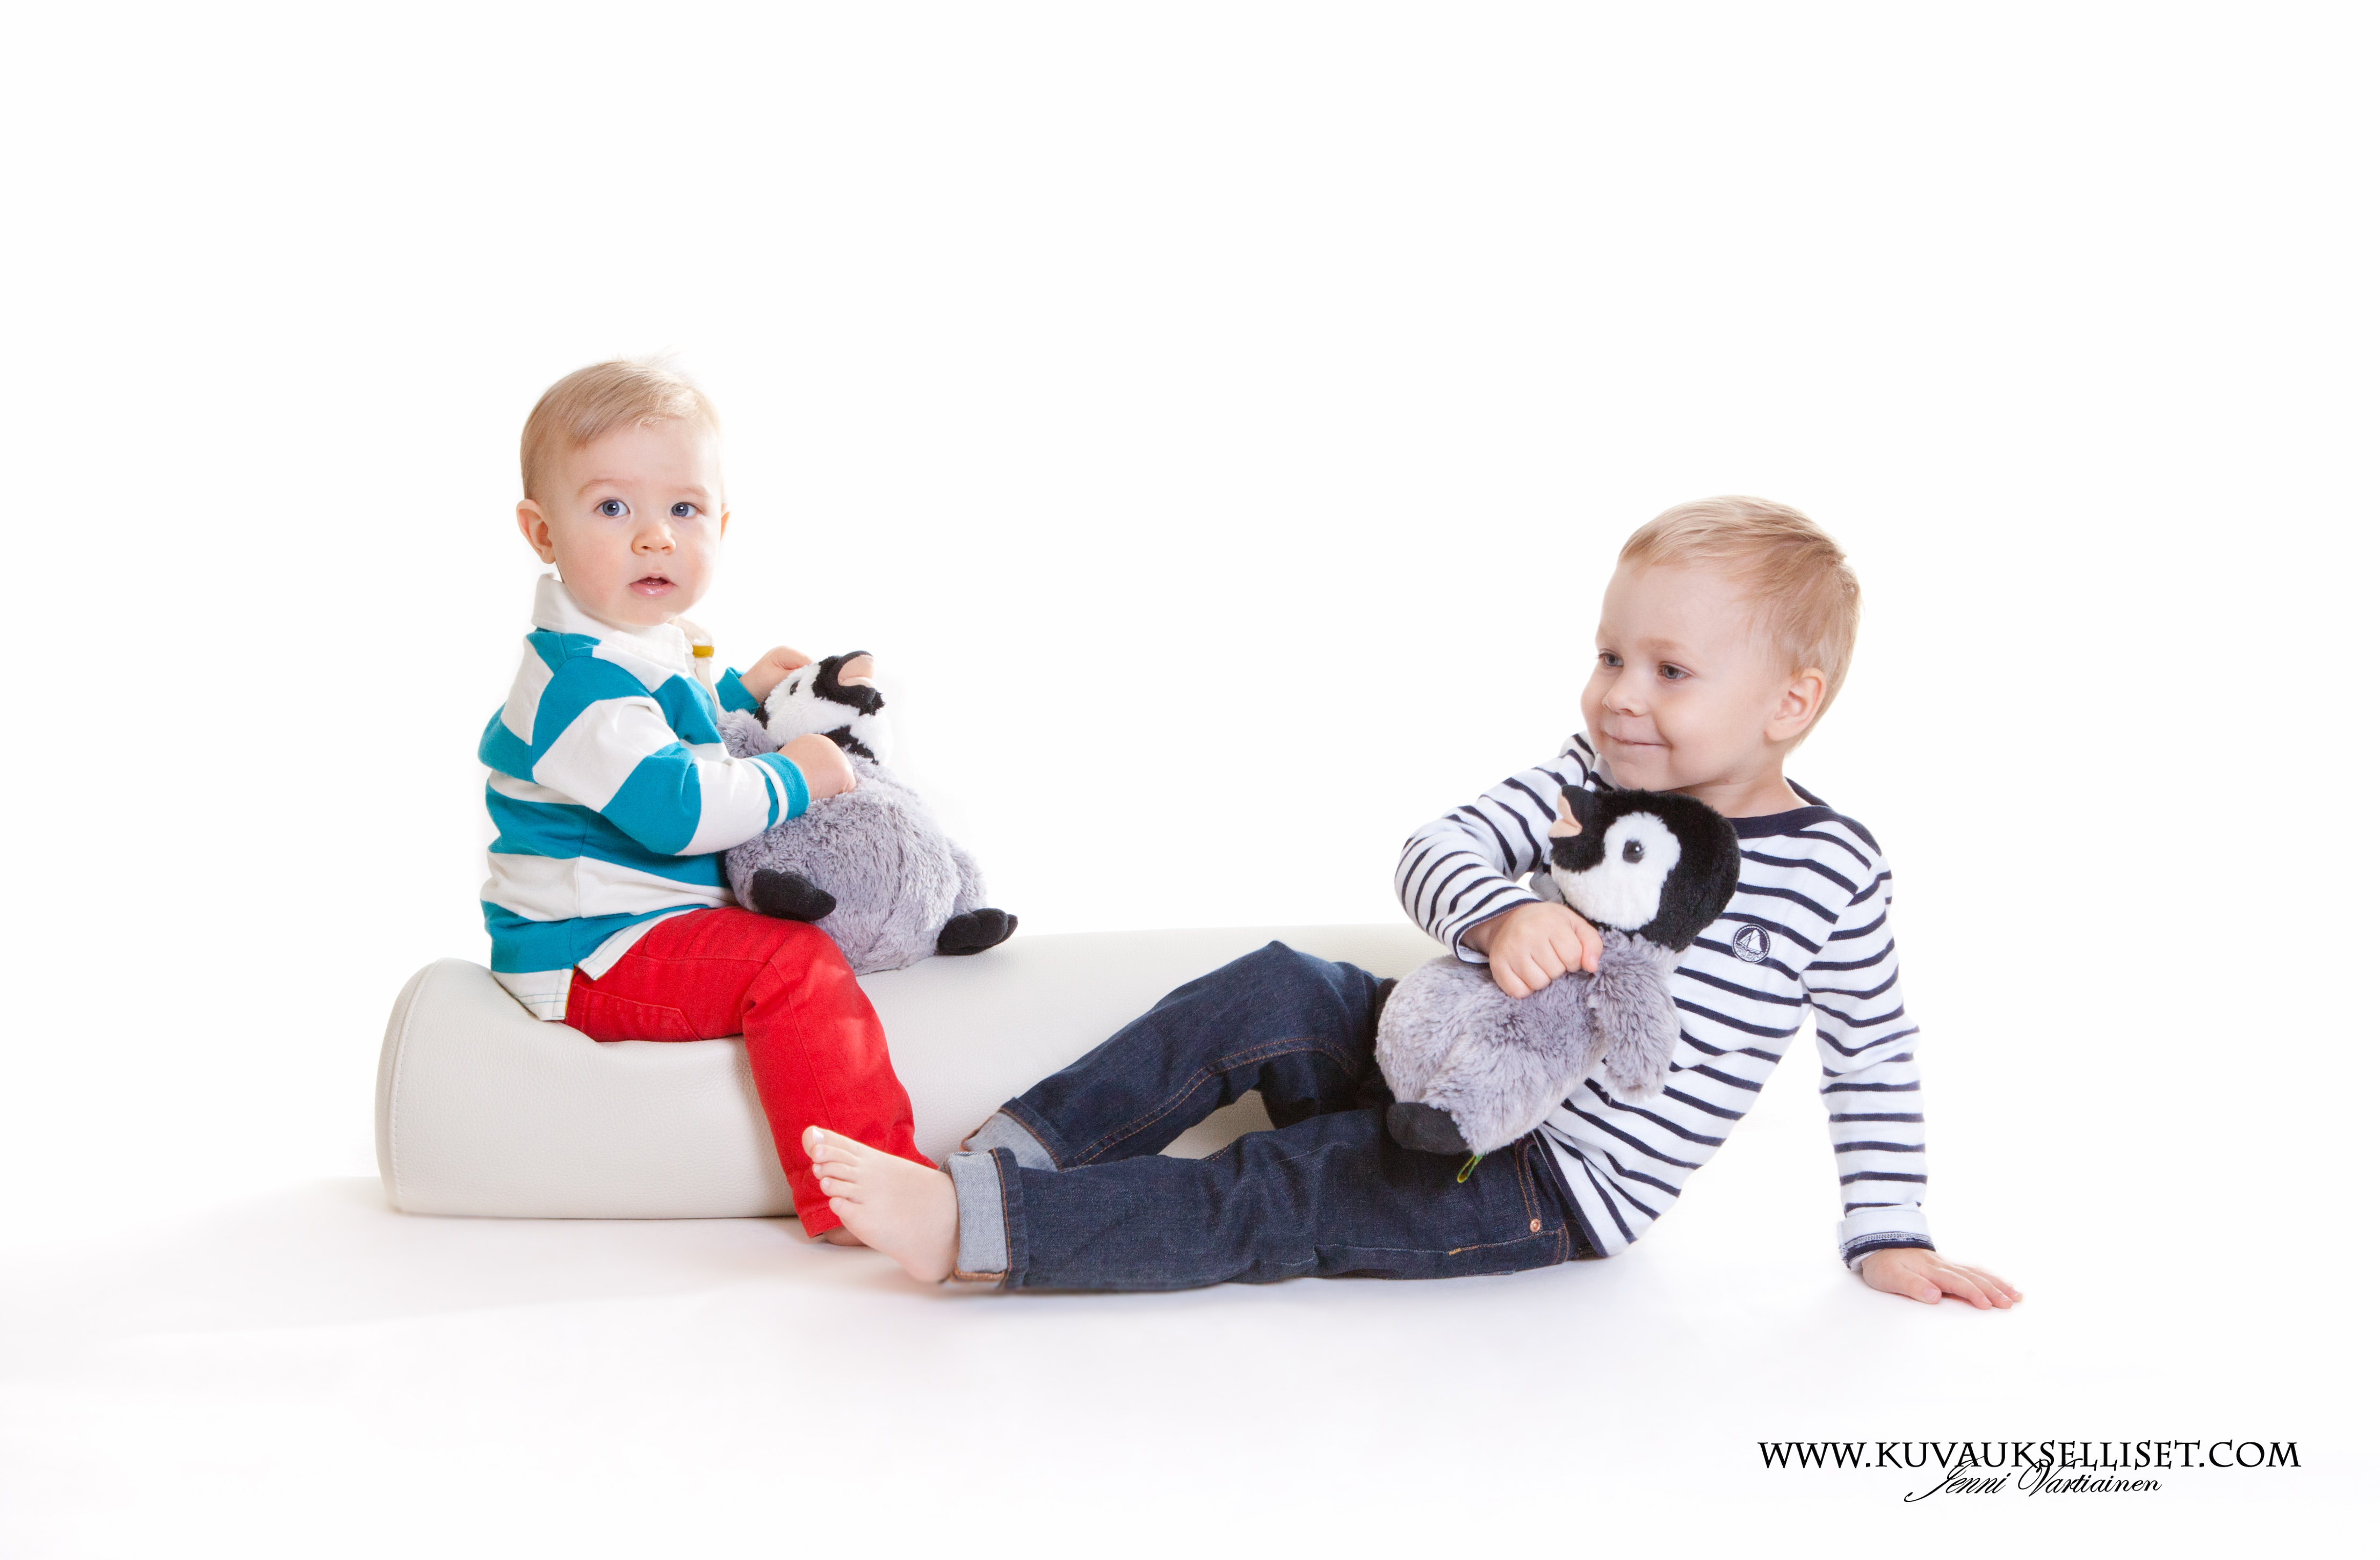 2014.10.6 lapsikuvaus miljöökuvaus perhekuvaus sisaruskuvaus family pictures päiväkotikuvaus